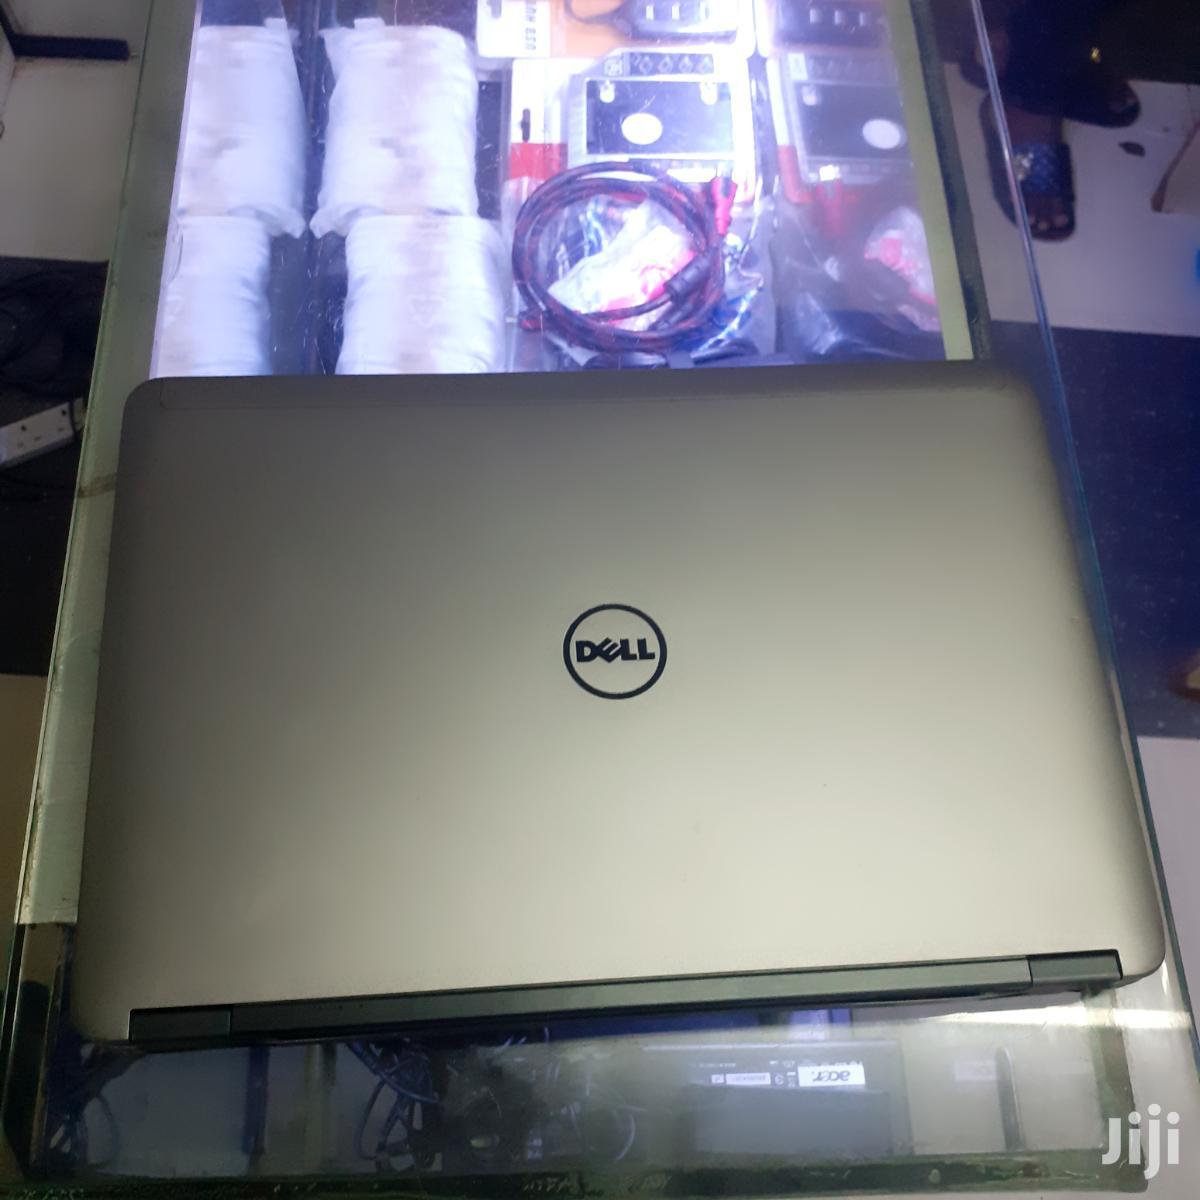 Laptop Dell Latitude E6400 4GB Intel Core i7 HDD 500GB | Laptops & Computers for sale in Kampala, Central Region, Uganda